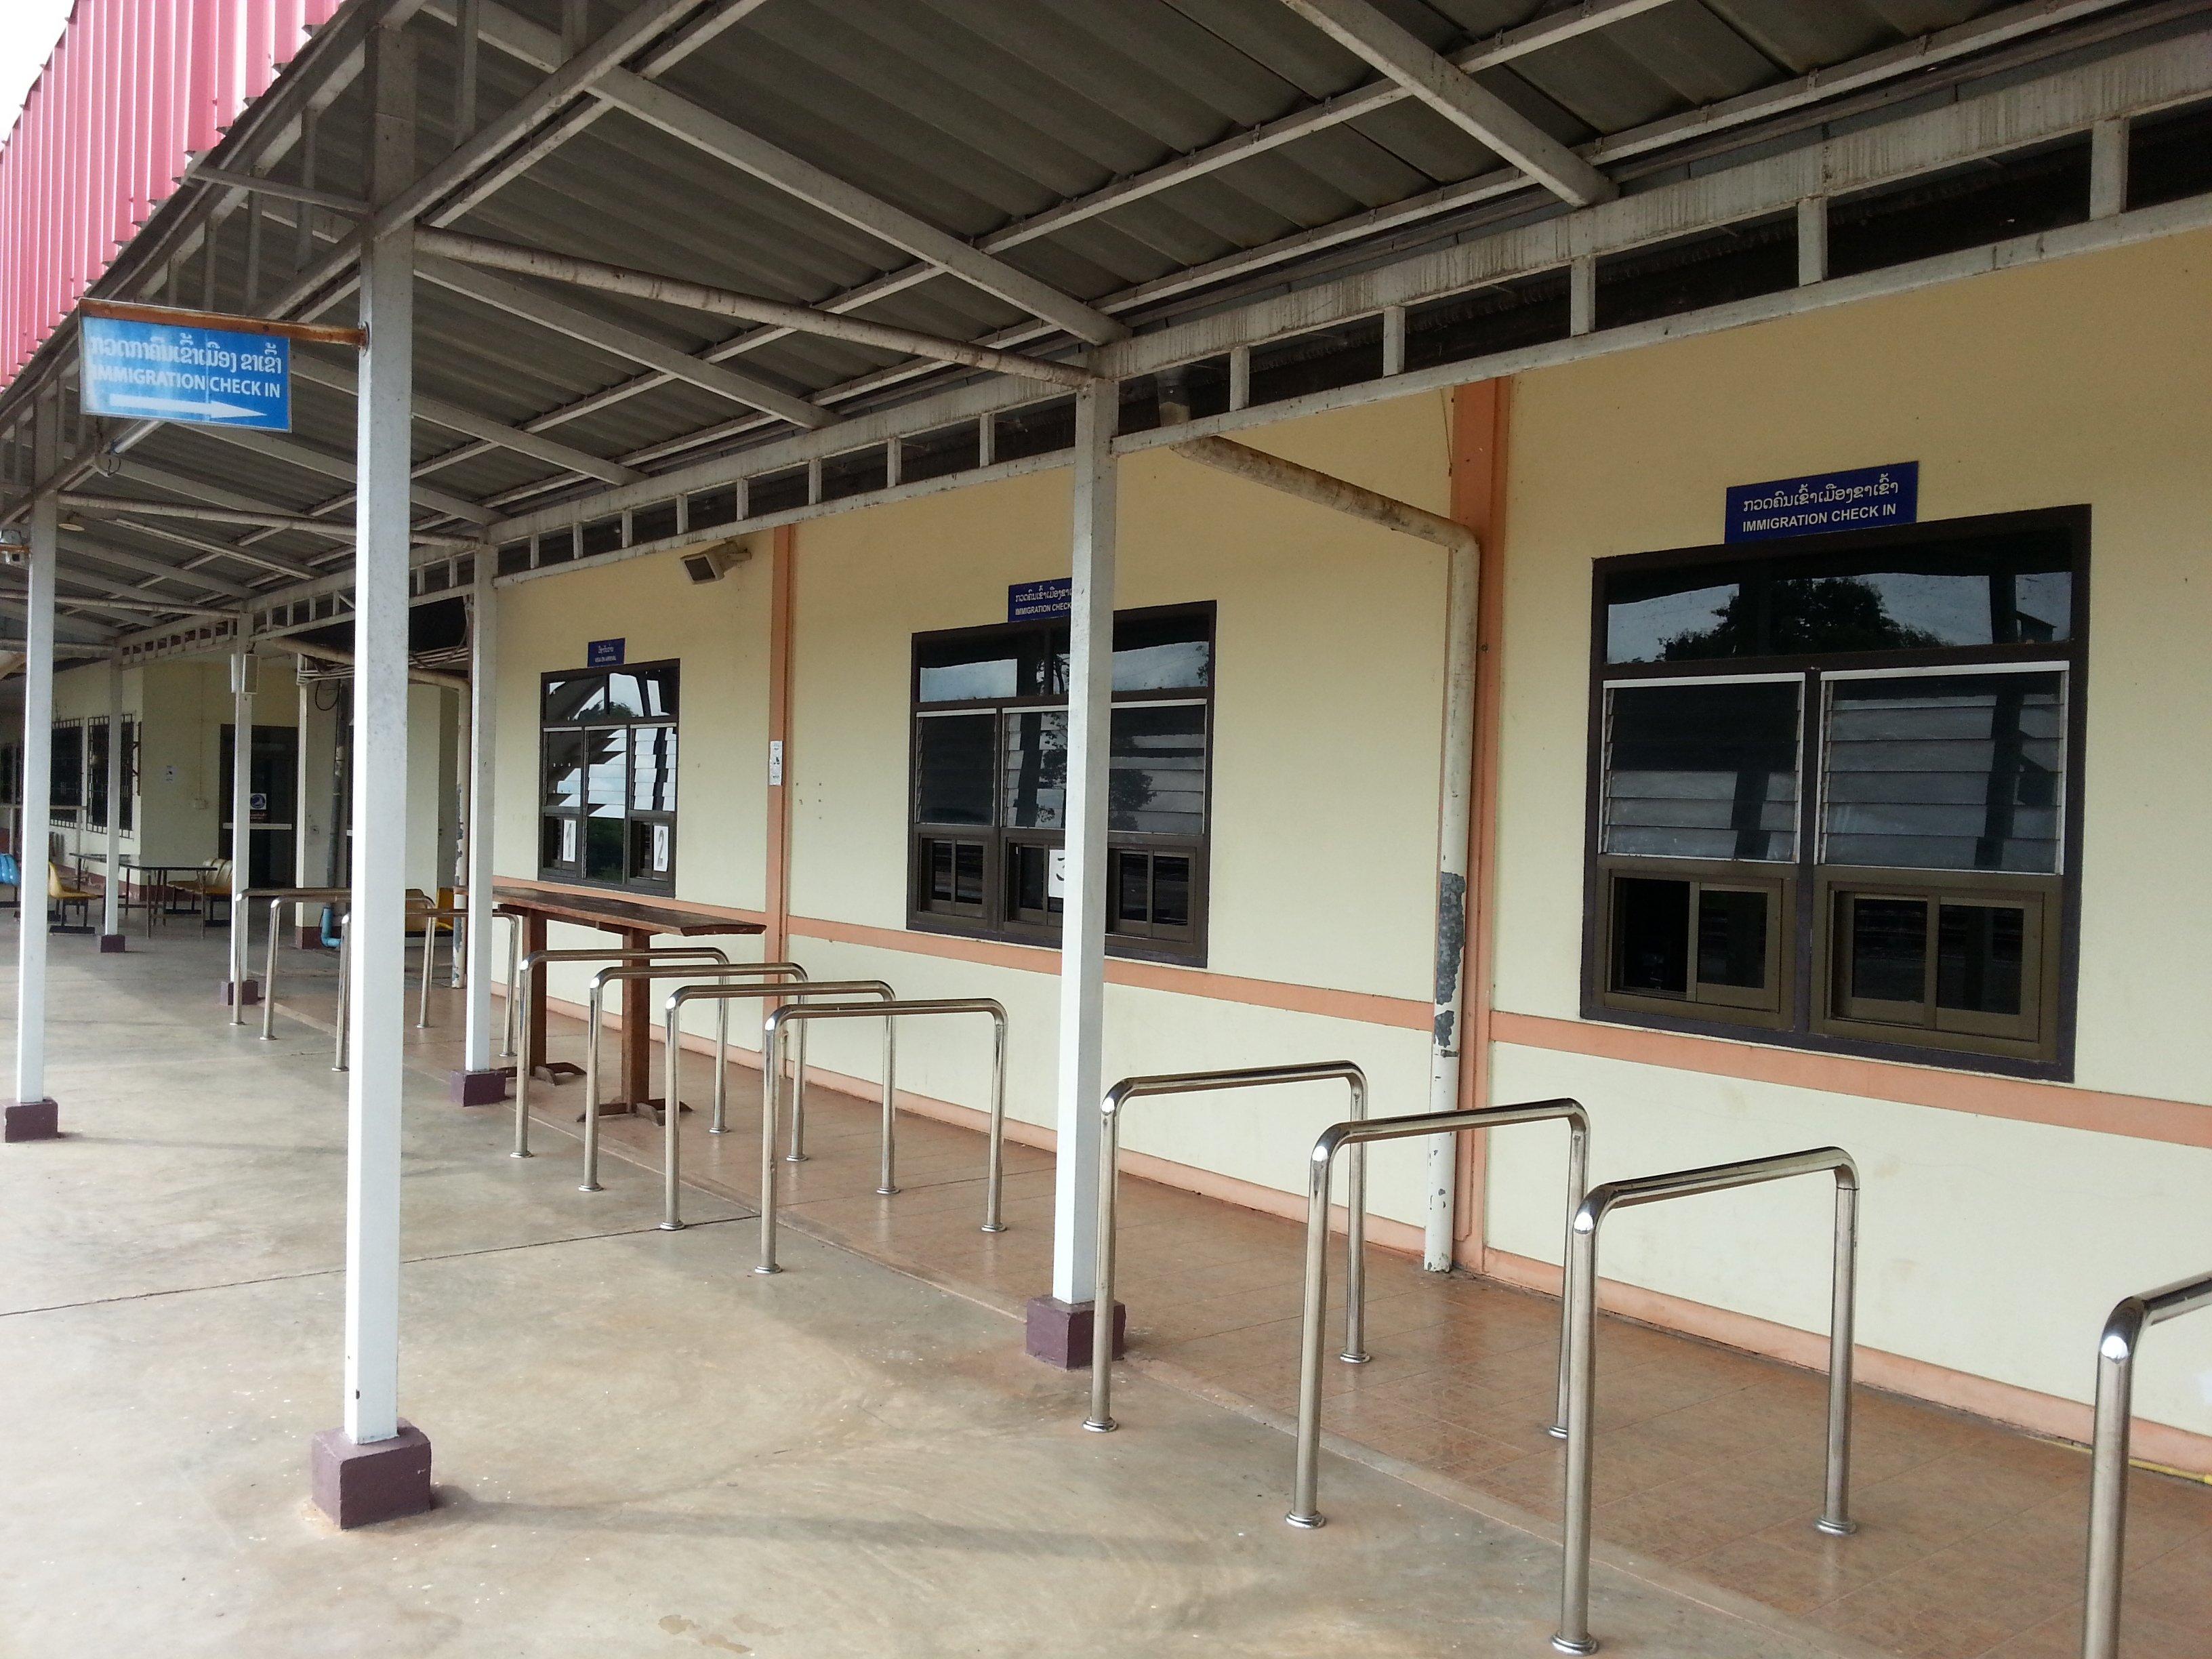 Passport control for entering Laos